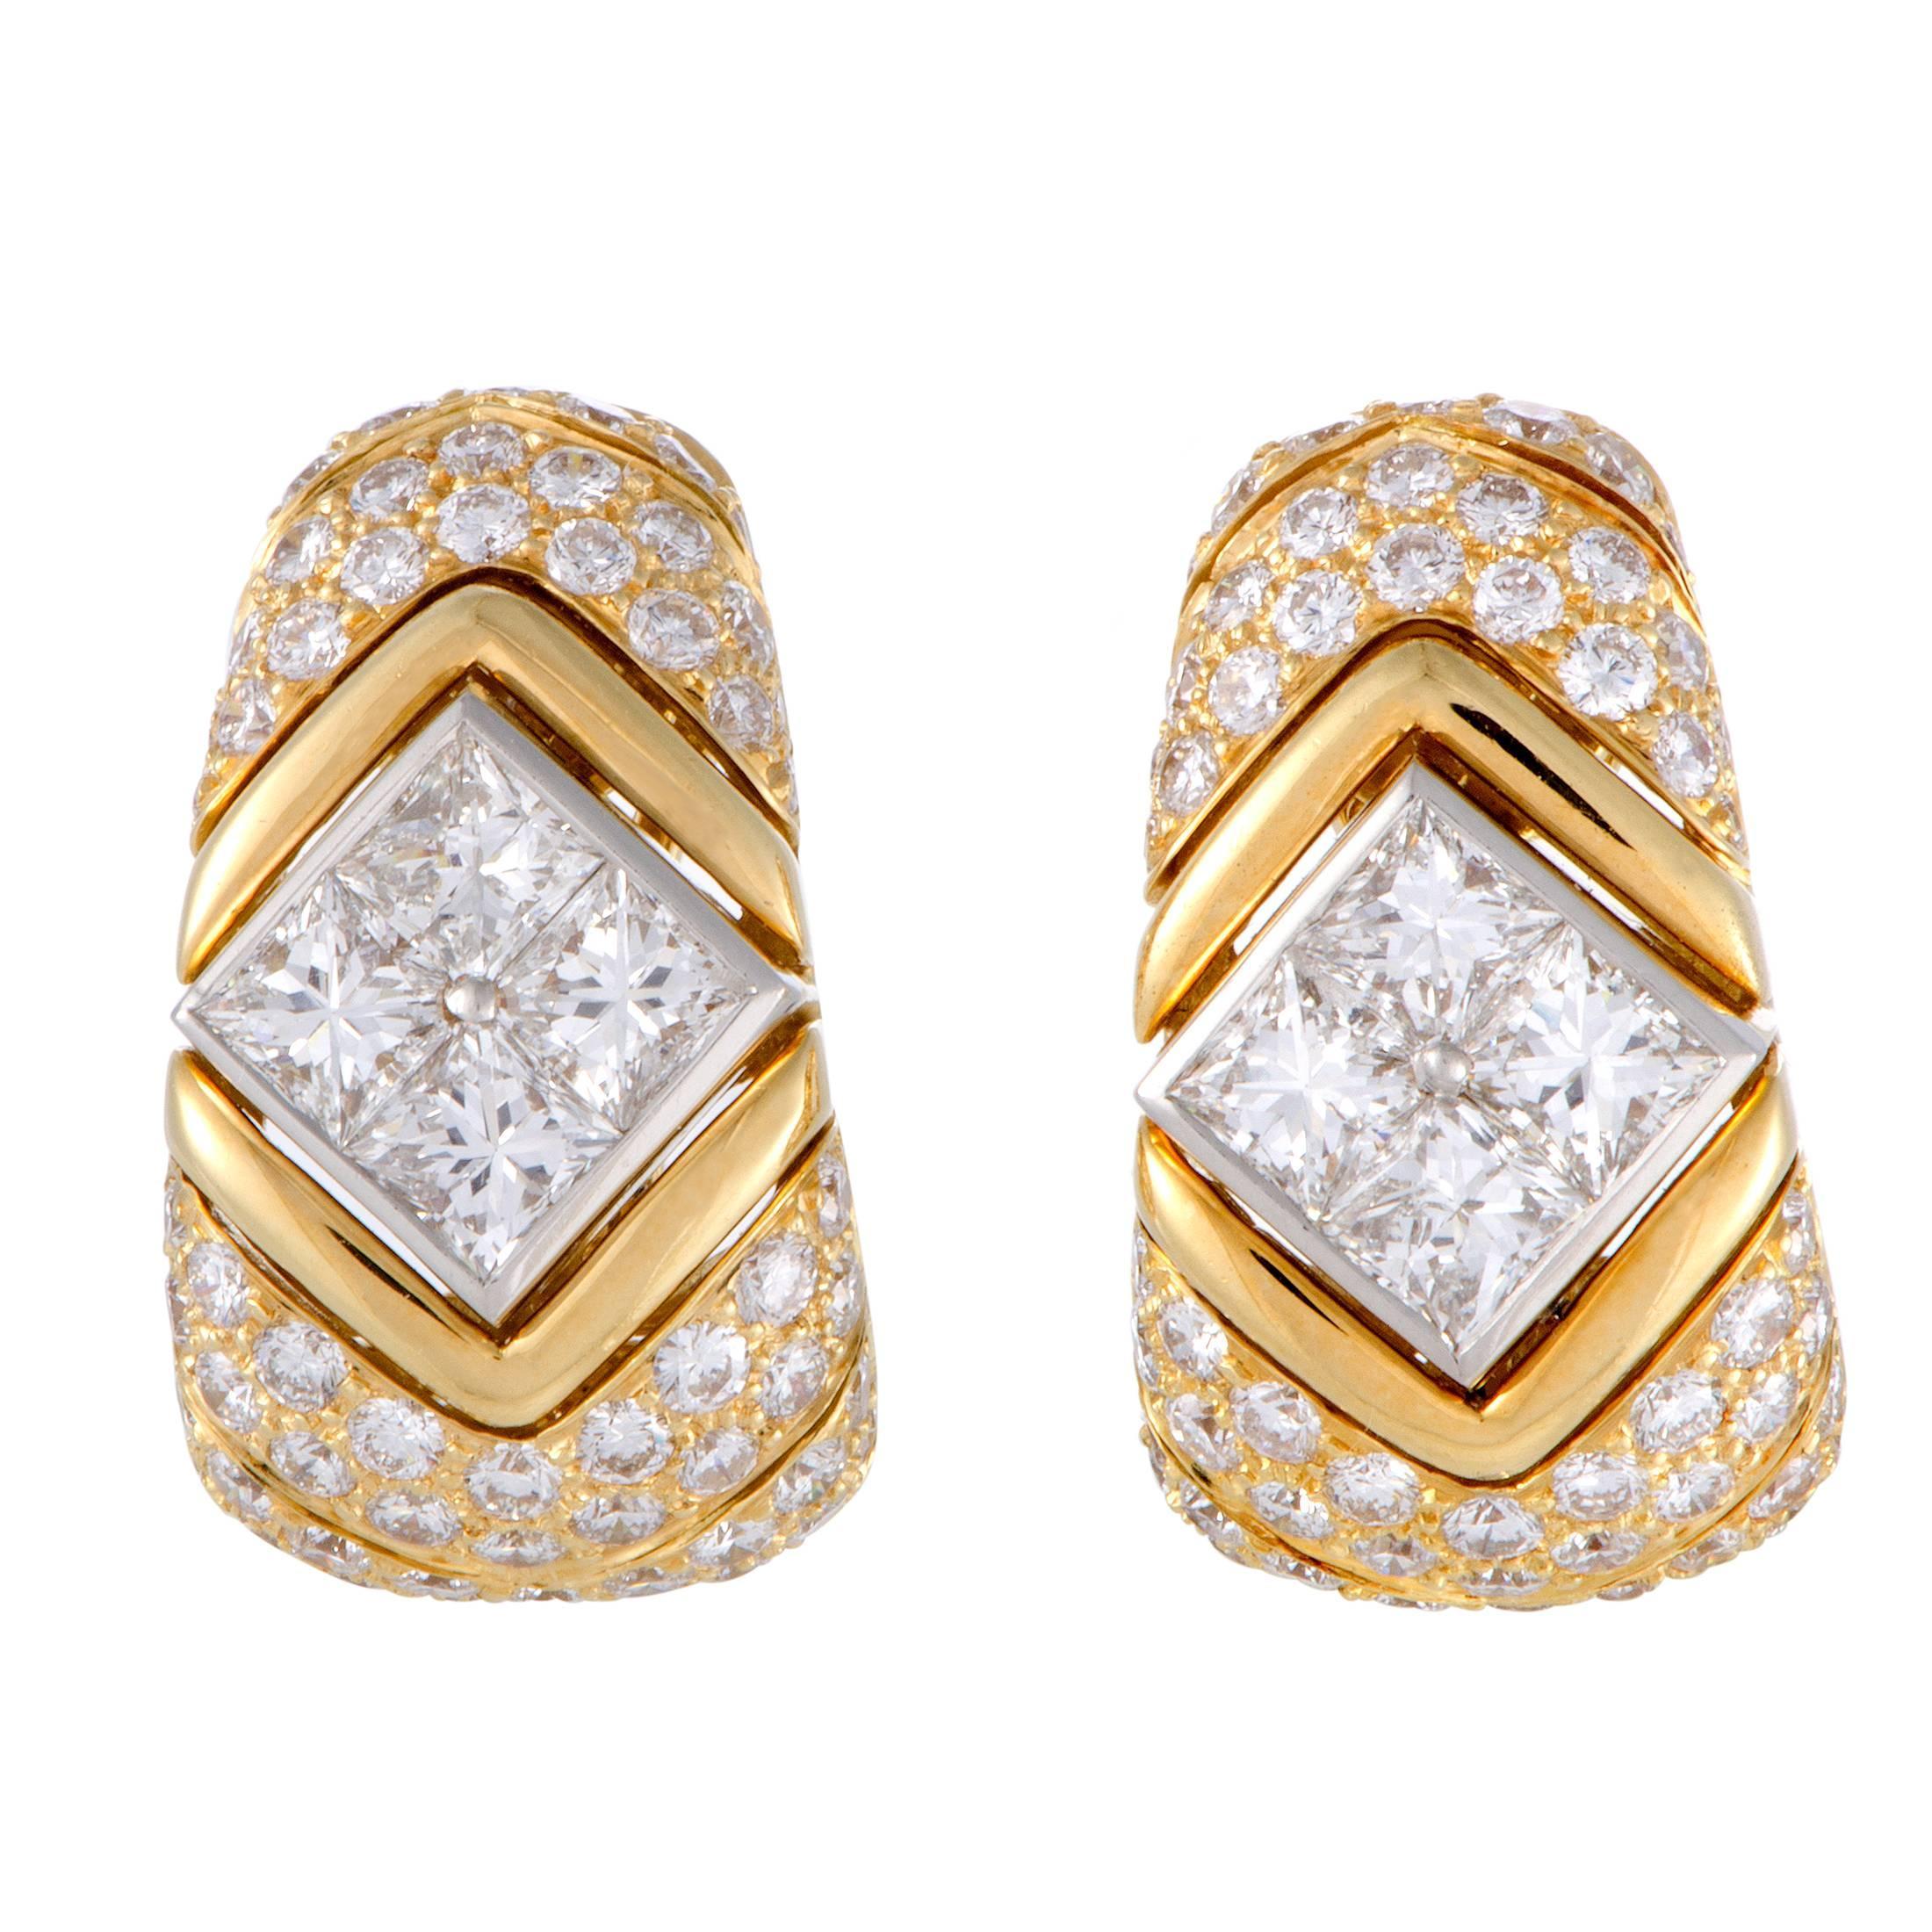 bulgari full diamond pave yellow gold and platinum clipon earrings 1